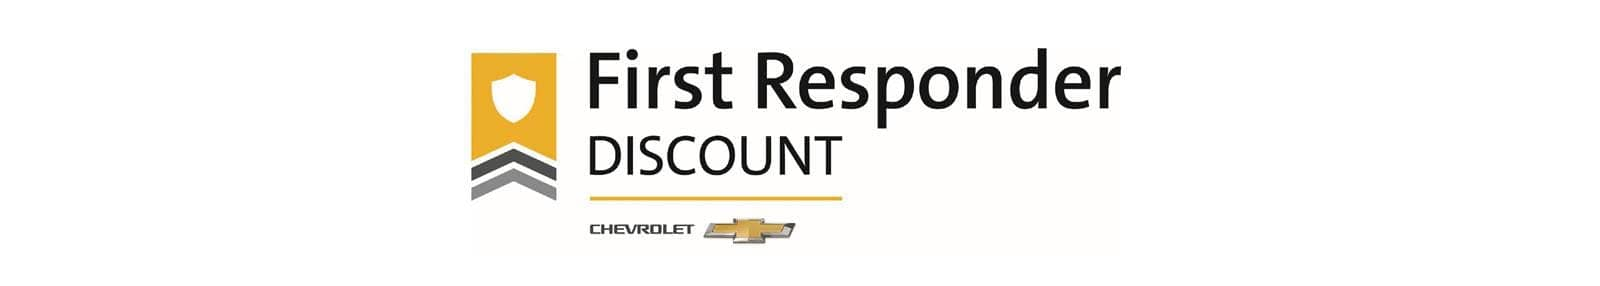 first-responder-discount